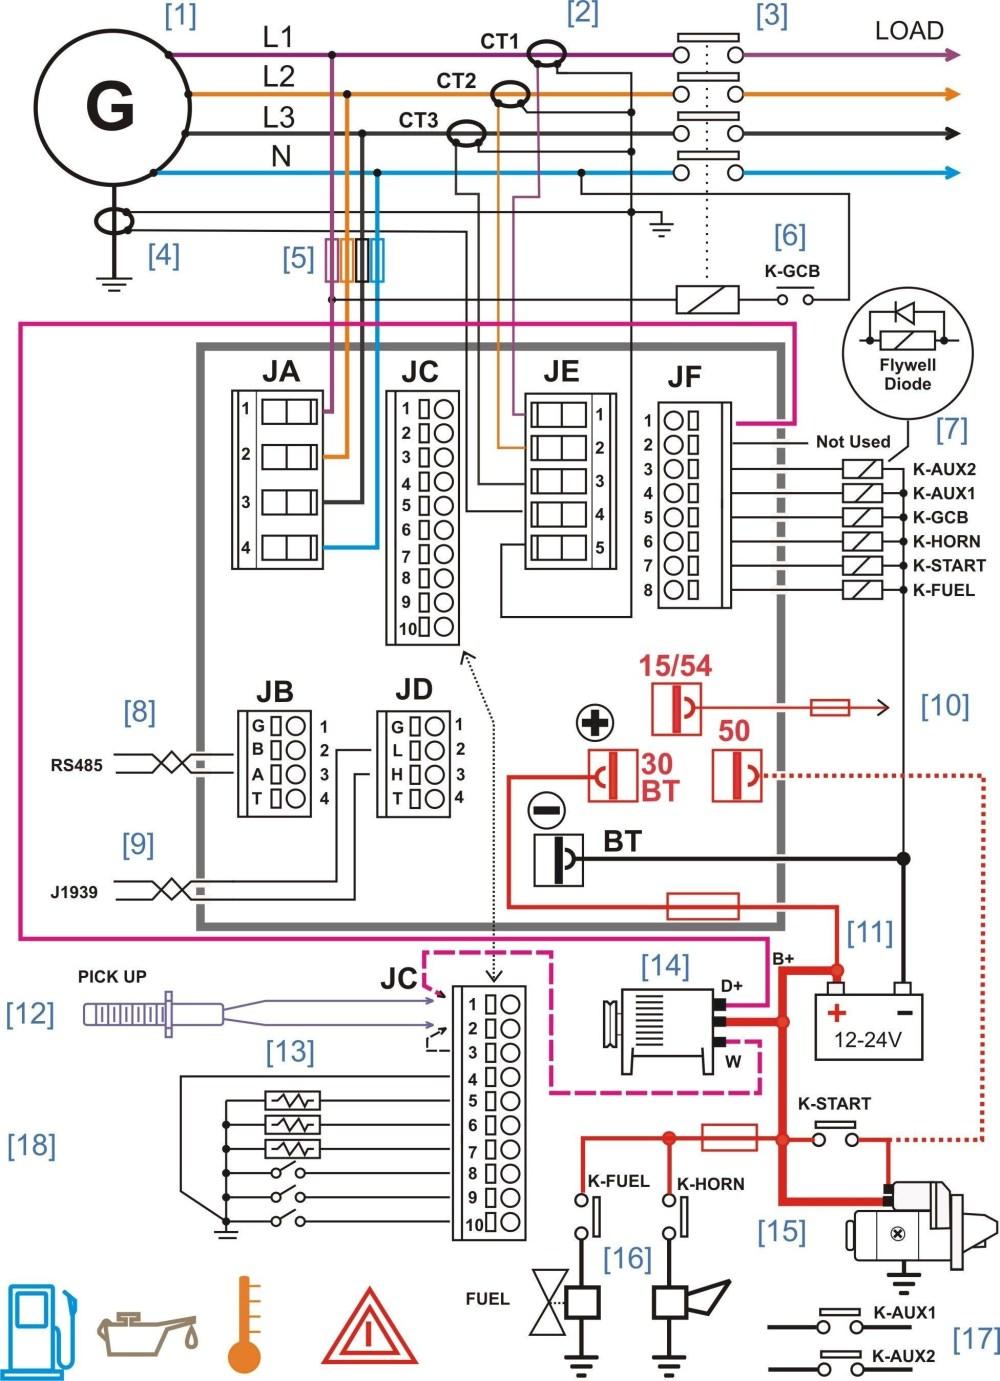 medium resolution of caterpillar c12 engine diagram olympian generator wiring diagram 4001e caterpillar inspirationa new